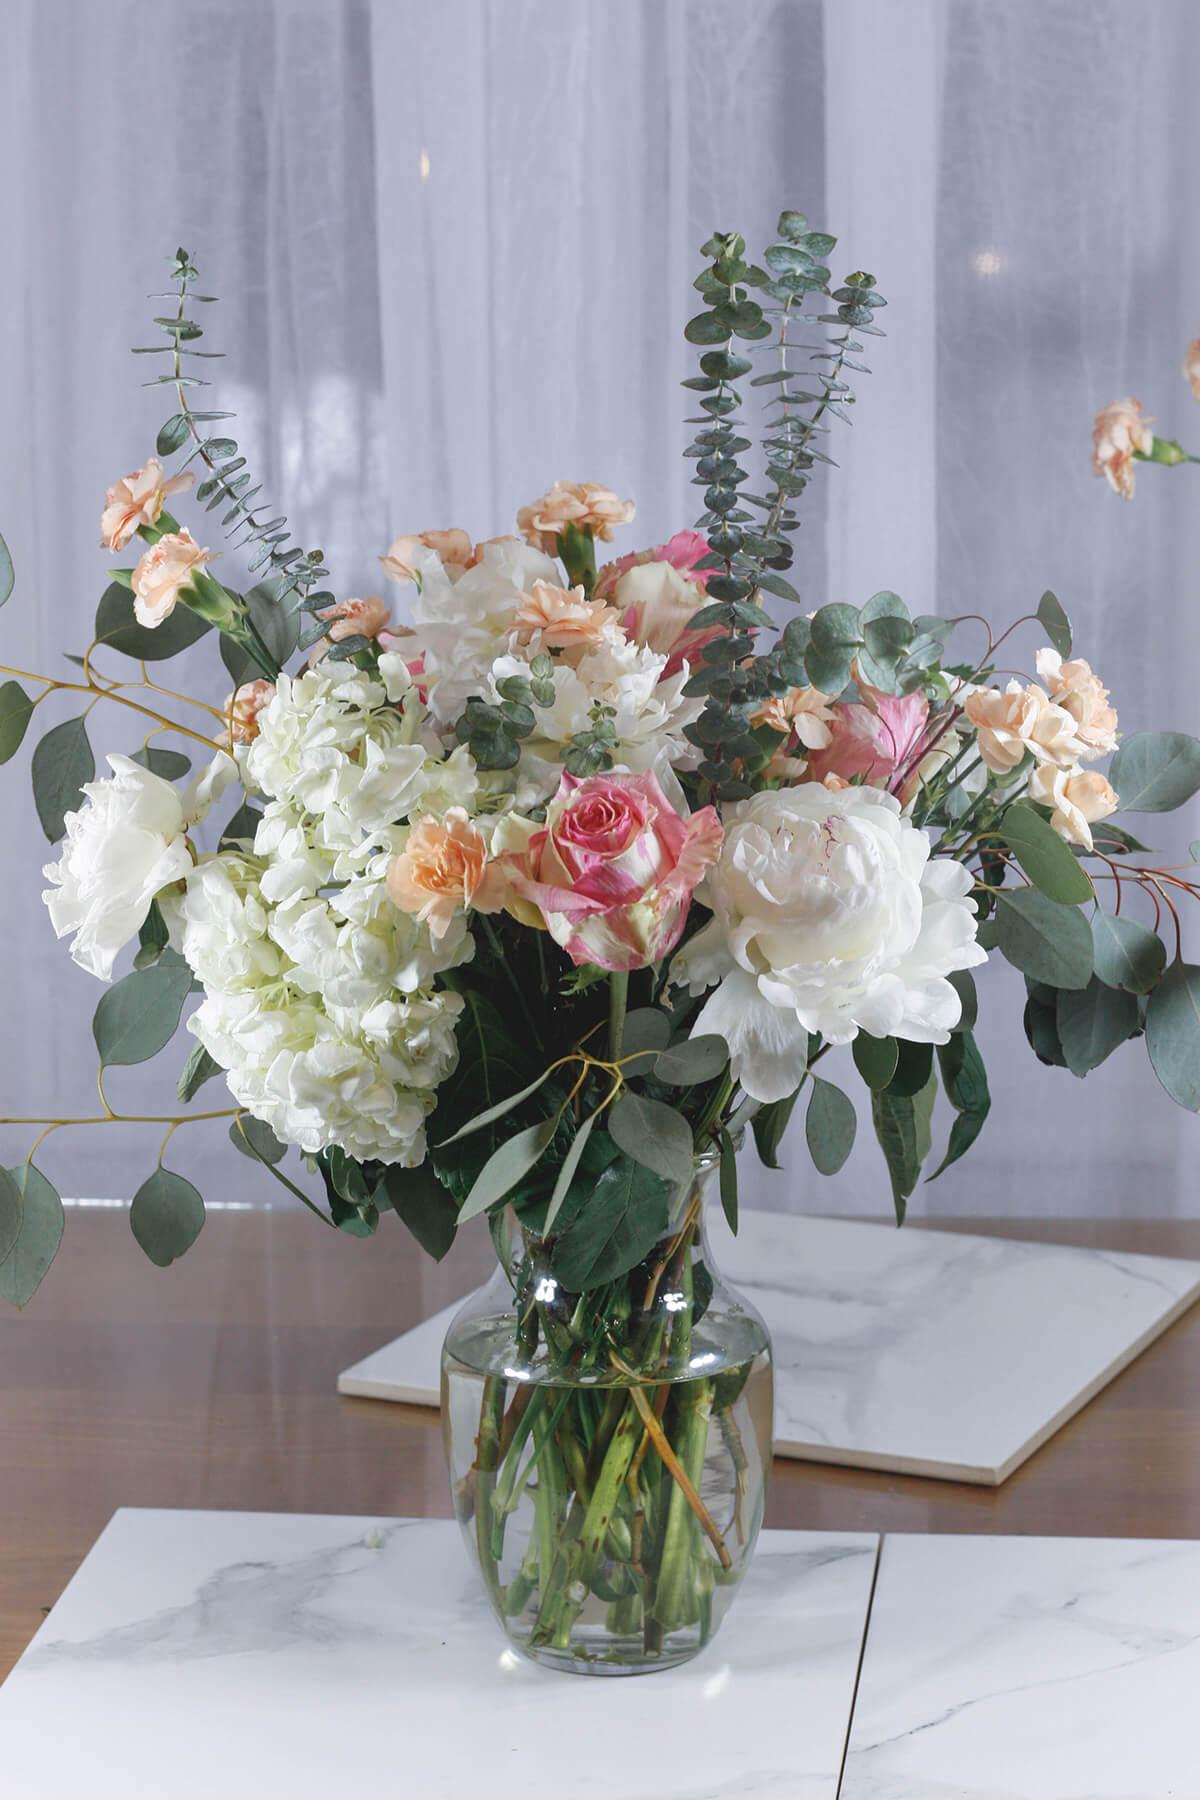 Cute Professional Looking Floral Arrangement